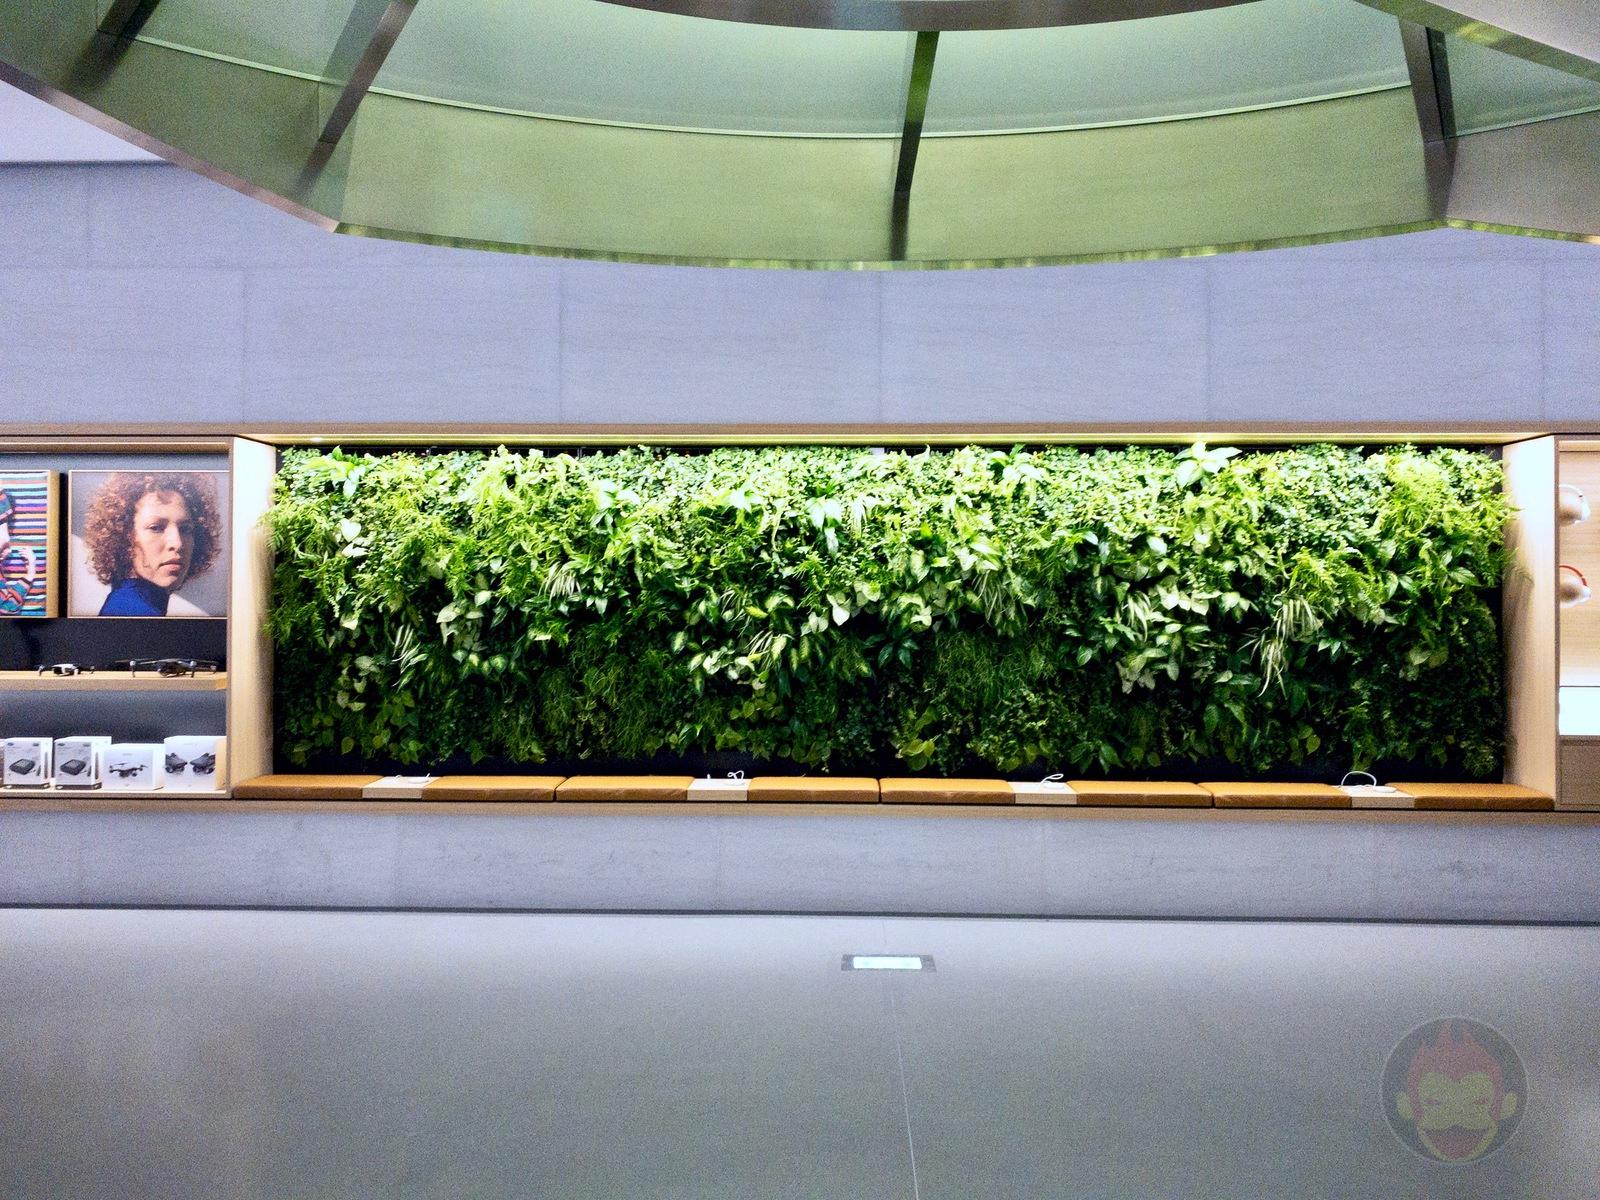 Apple Store Omotesando Basement floor renewal 50